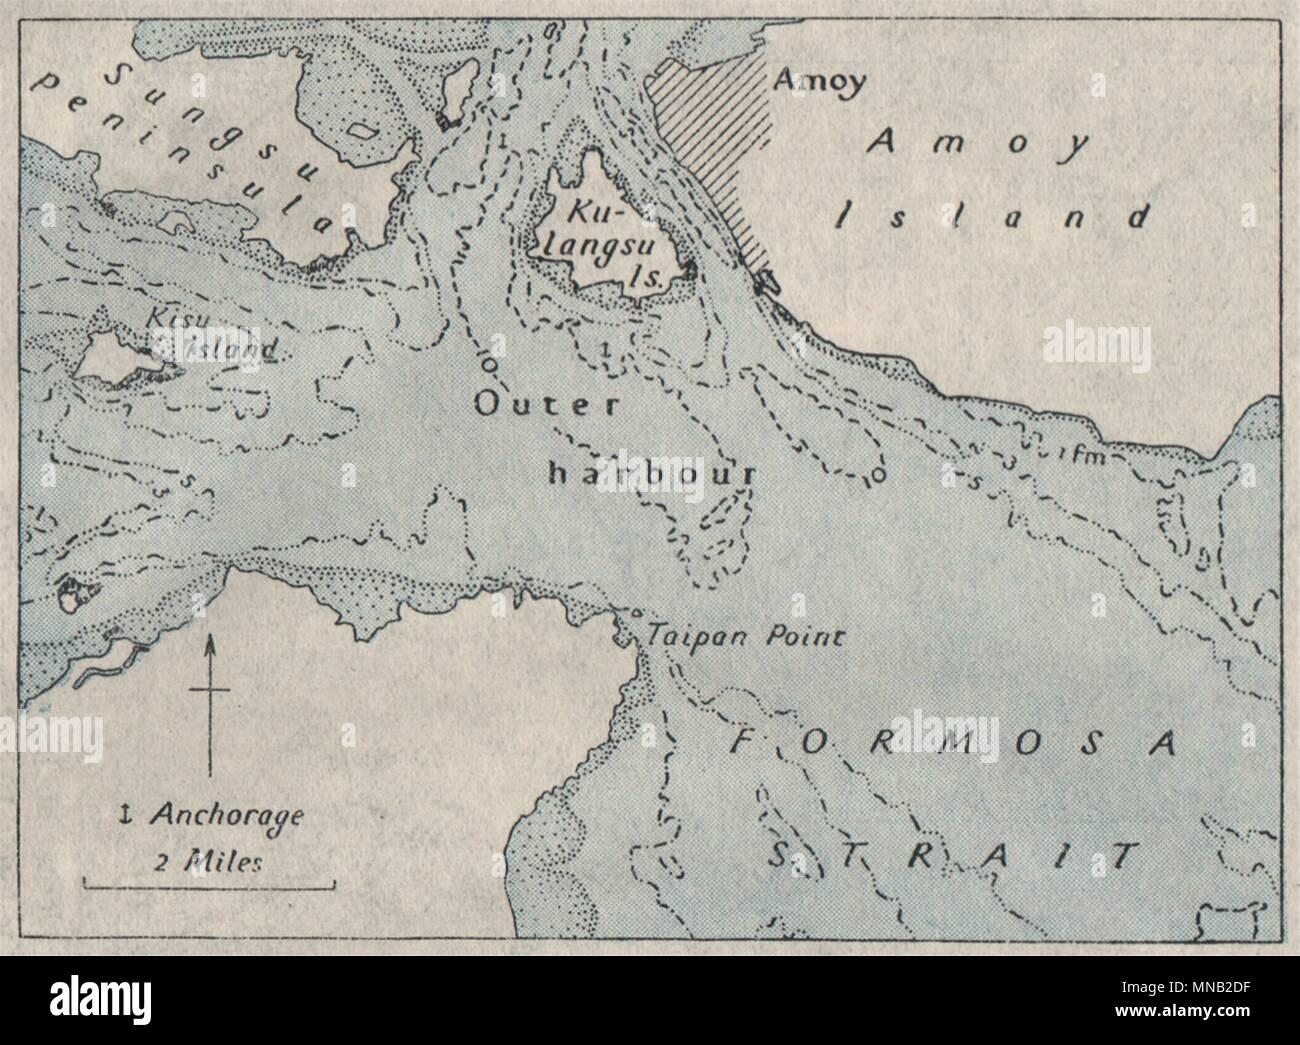 Xiamen China Map.Approaches To Amoy Xiamen China Ww2 Royal Navy Intelligence Map